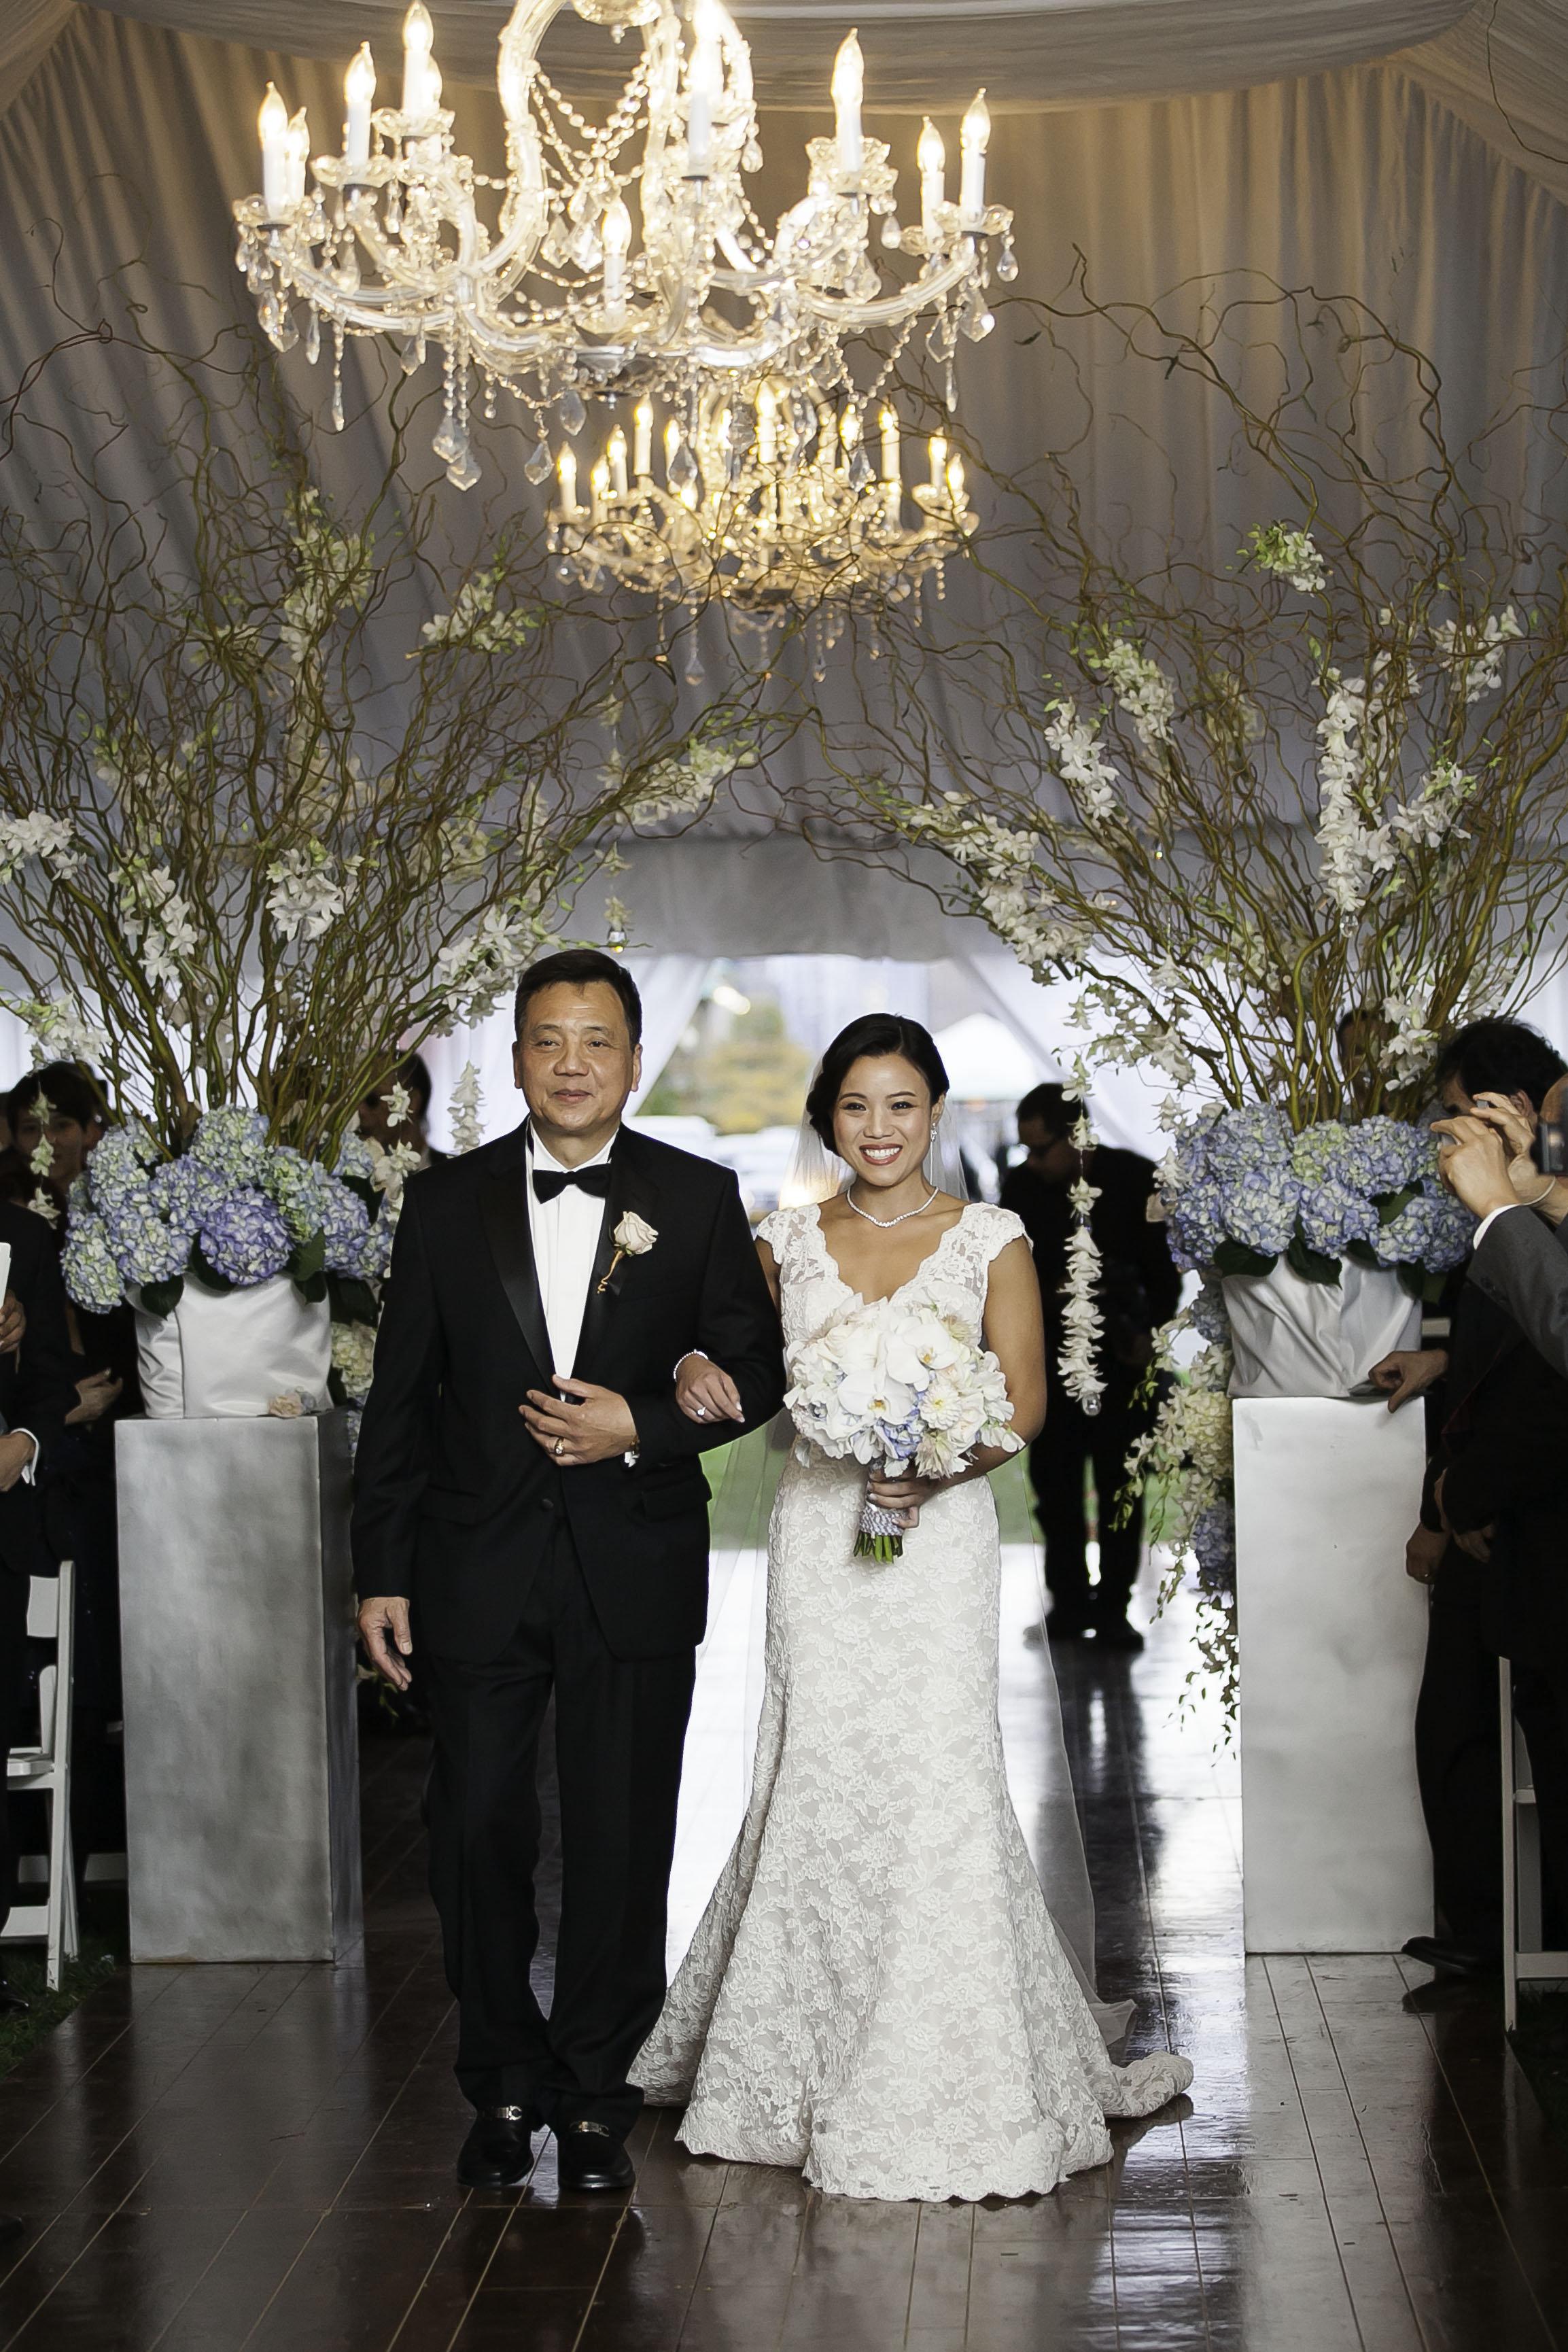 Courtney Calvin s Wedding 10 8 14-1court and cal wedding day-0597.jpg